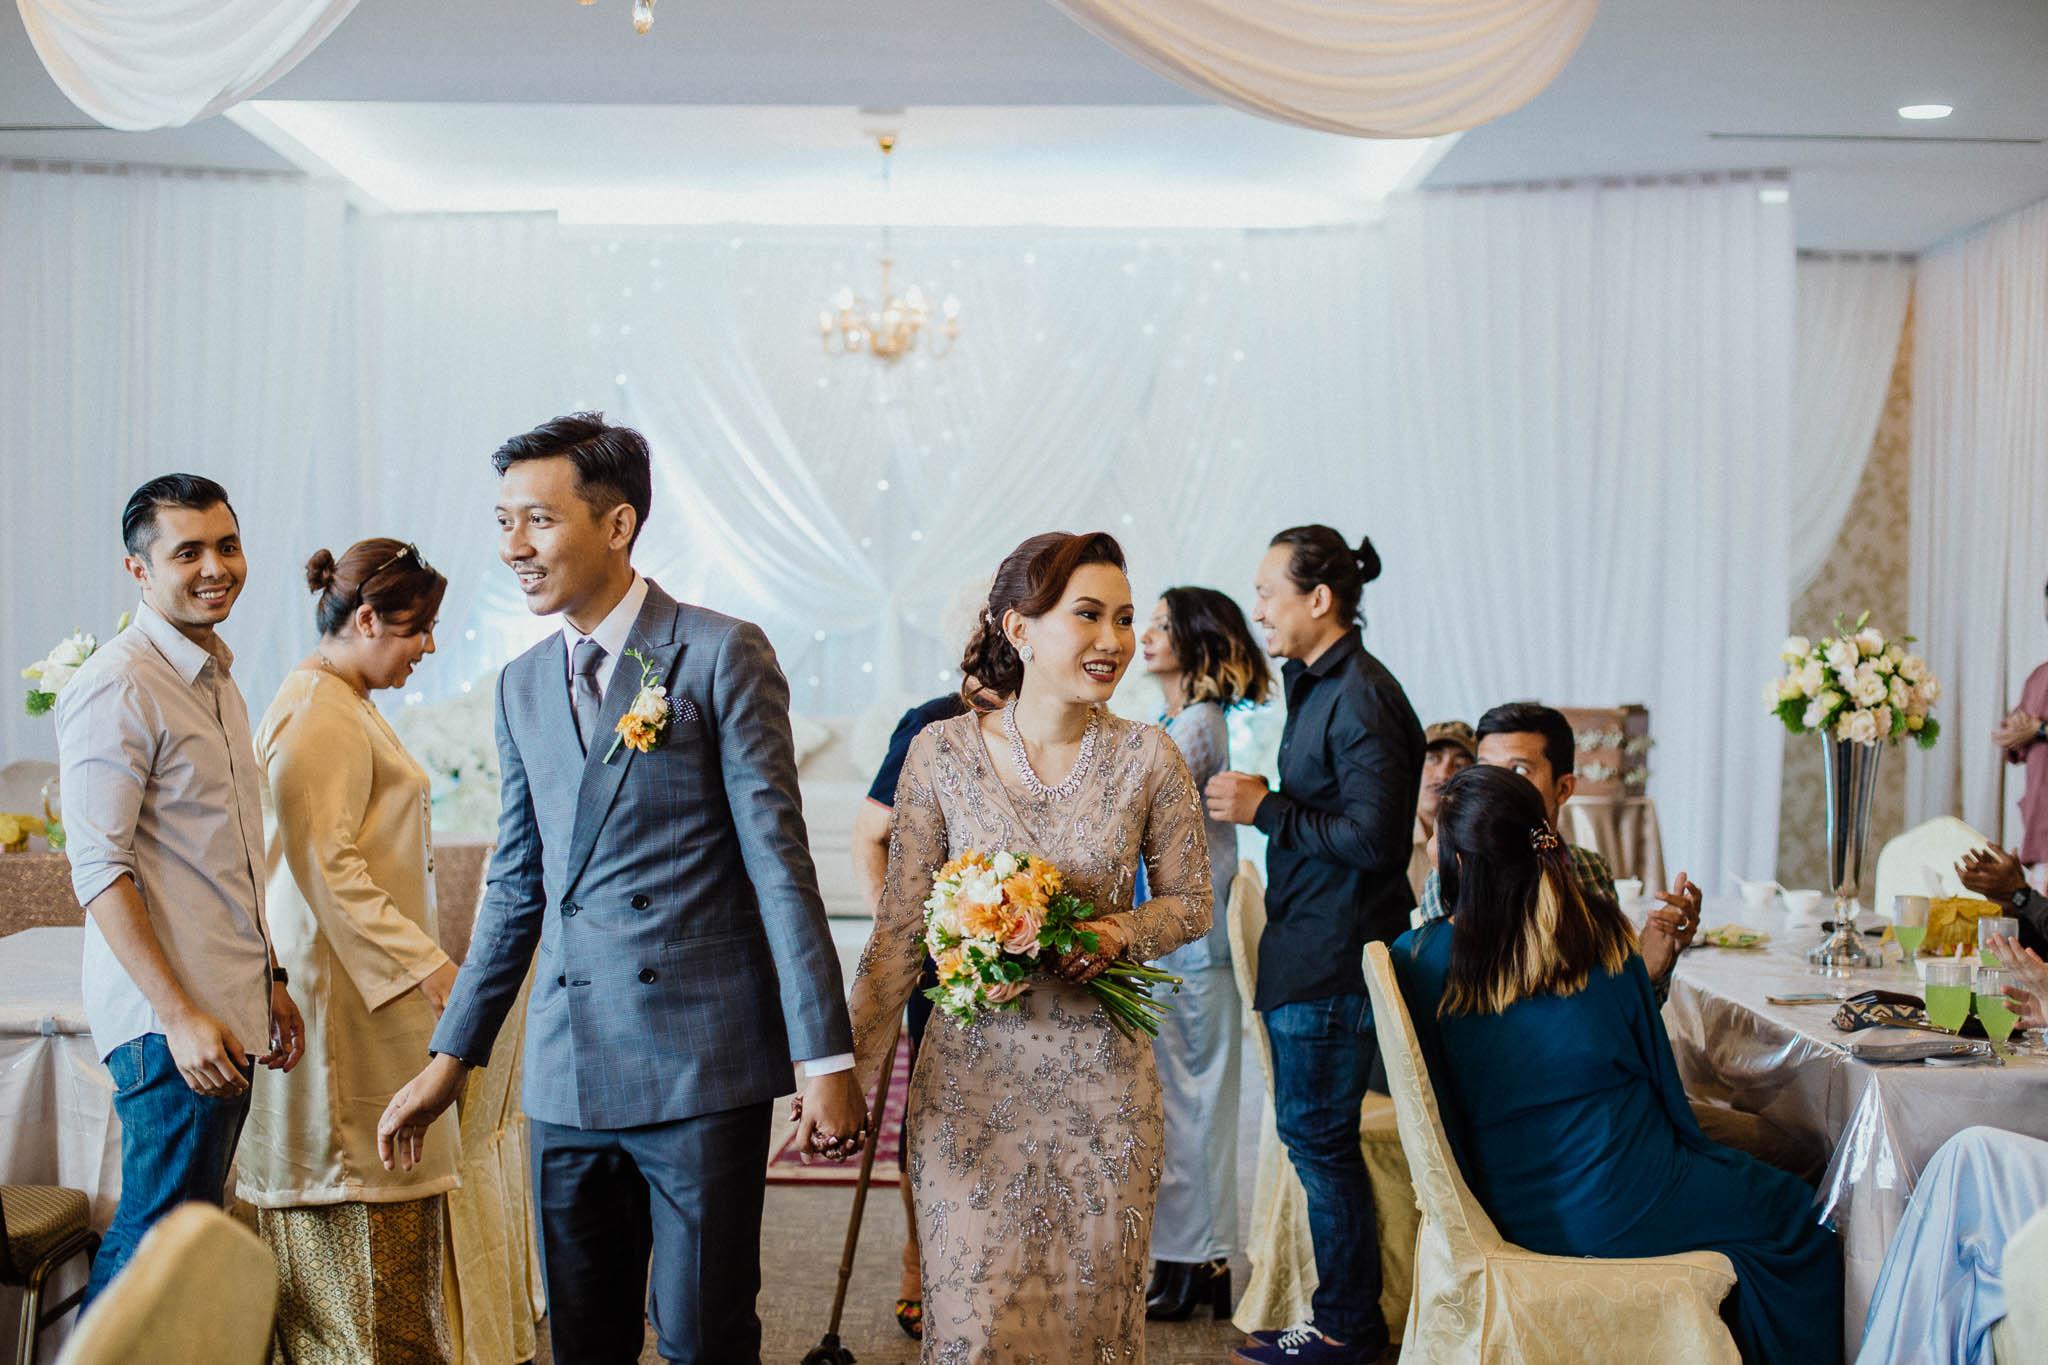 singapore-wedding-photographer-addafiq-nufail-066.jpg